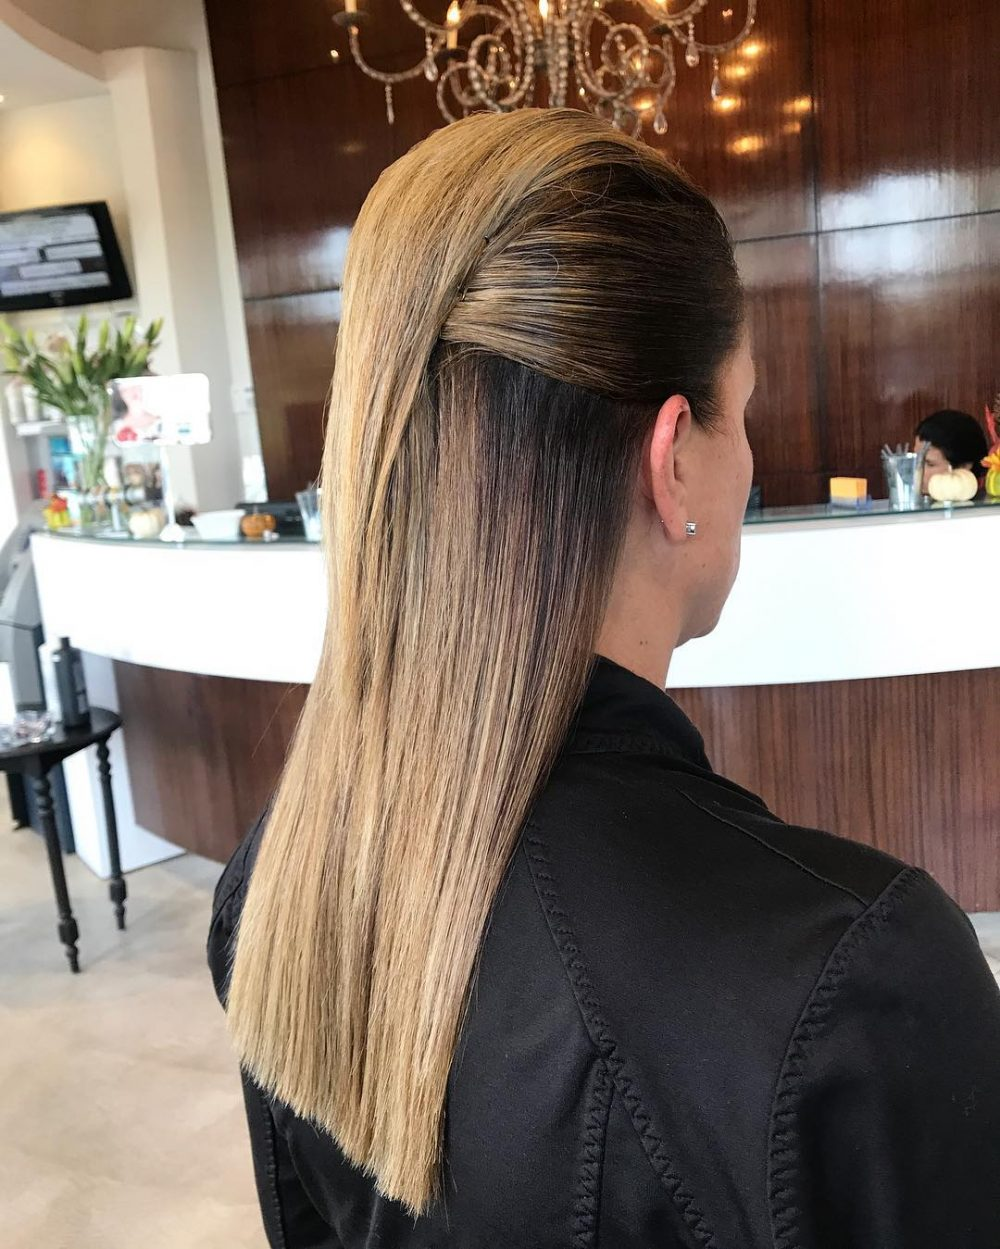 Sleek Faux Hawk hairstyle